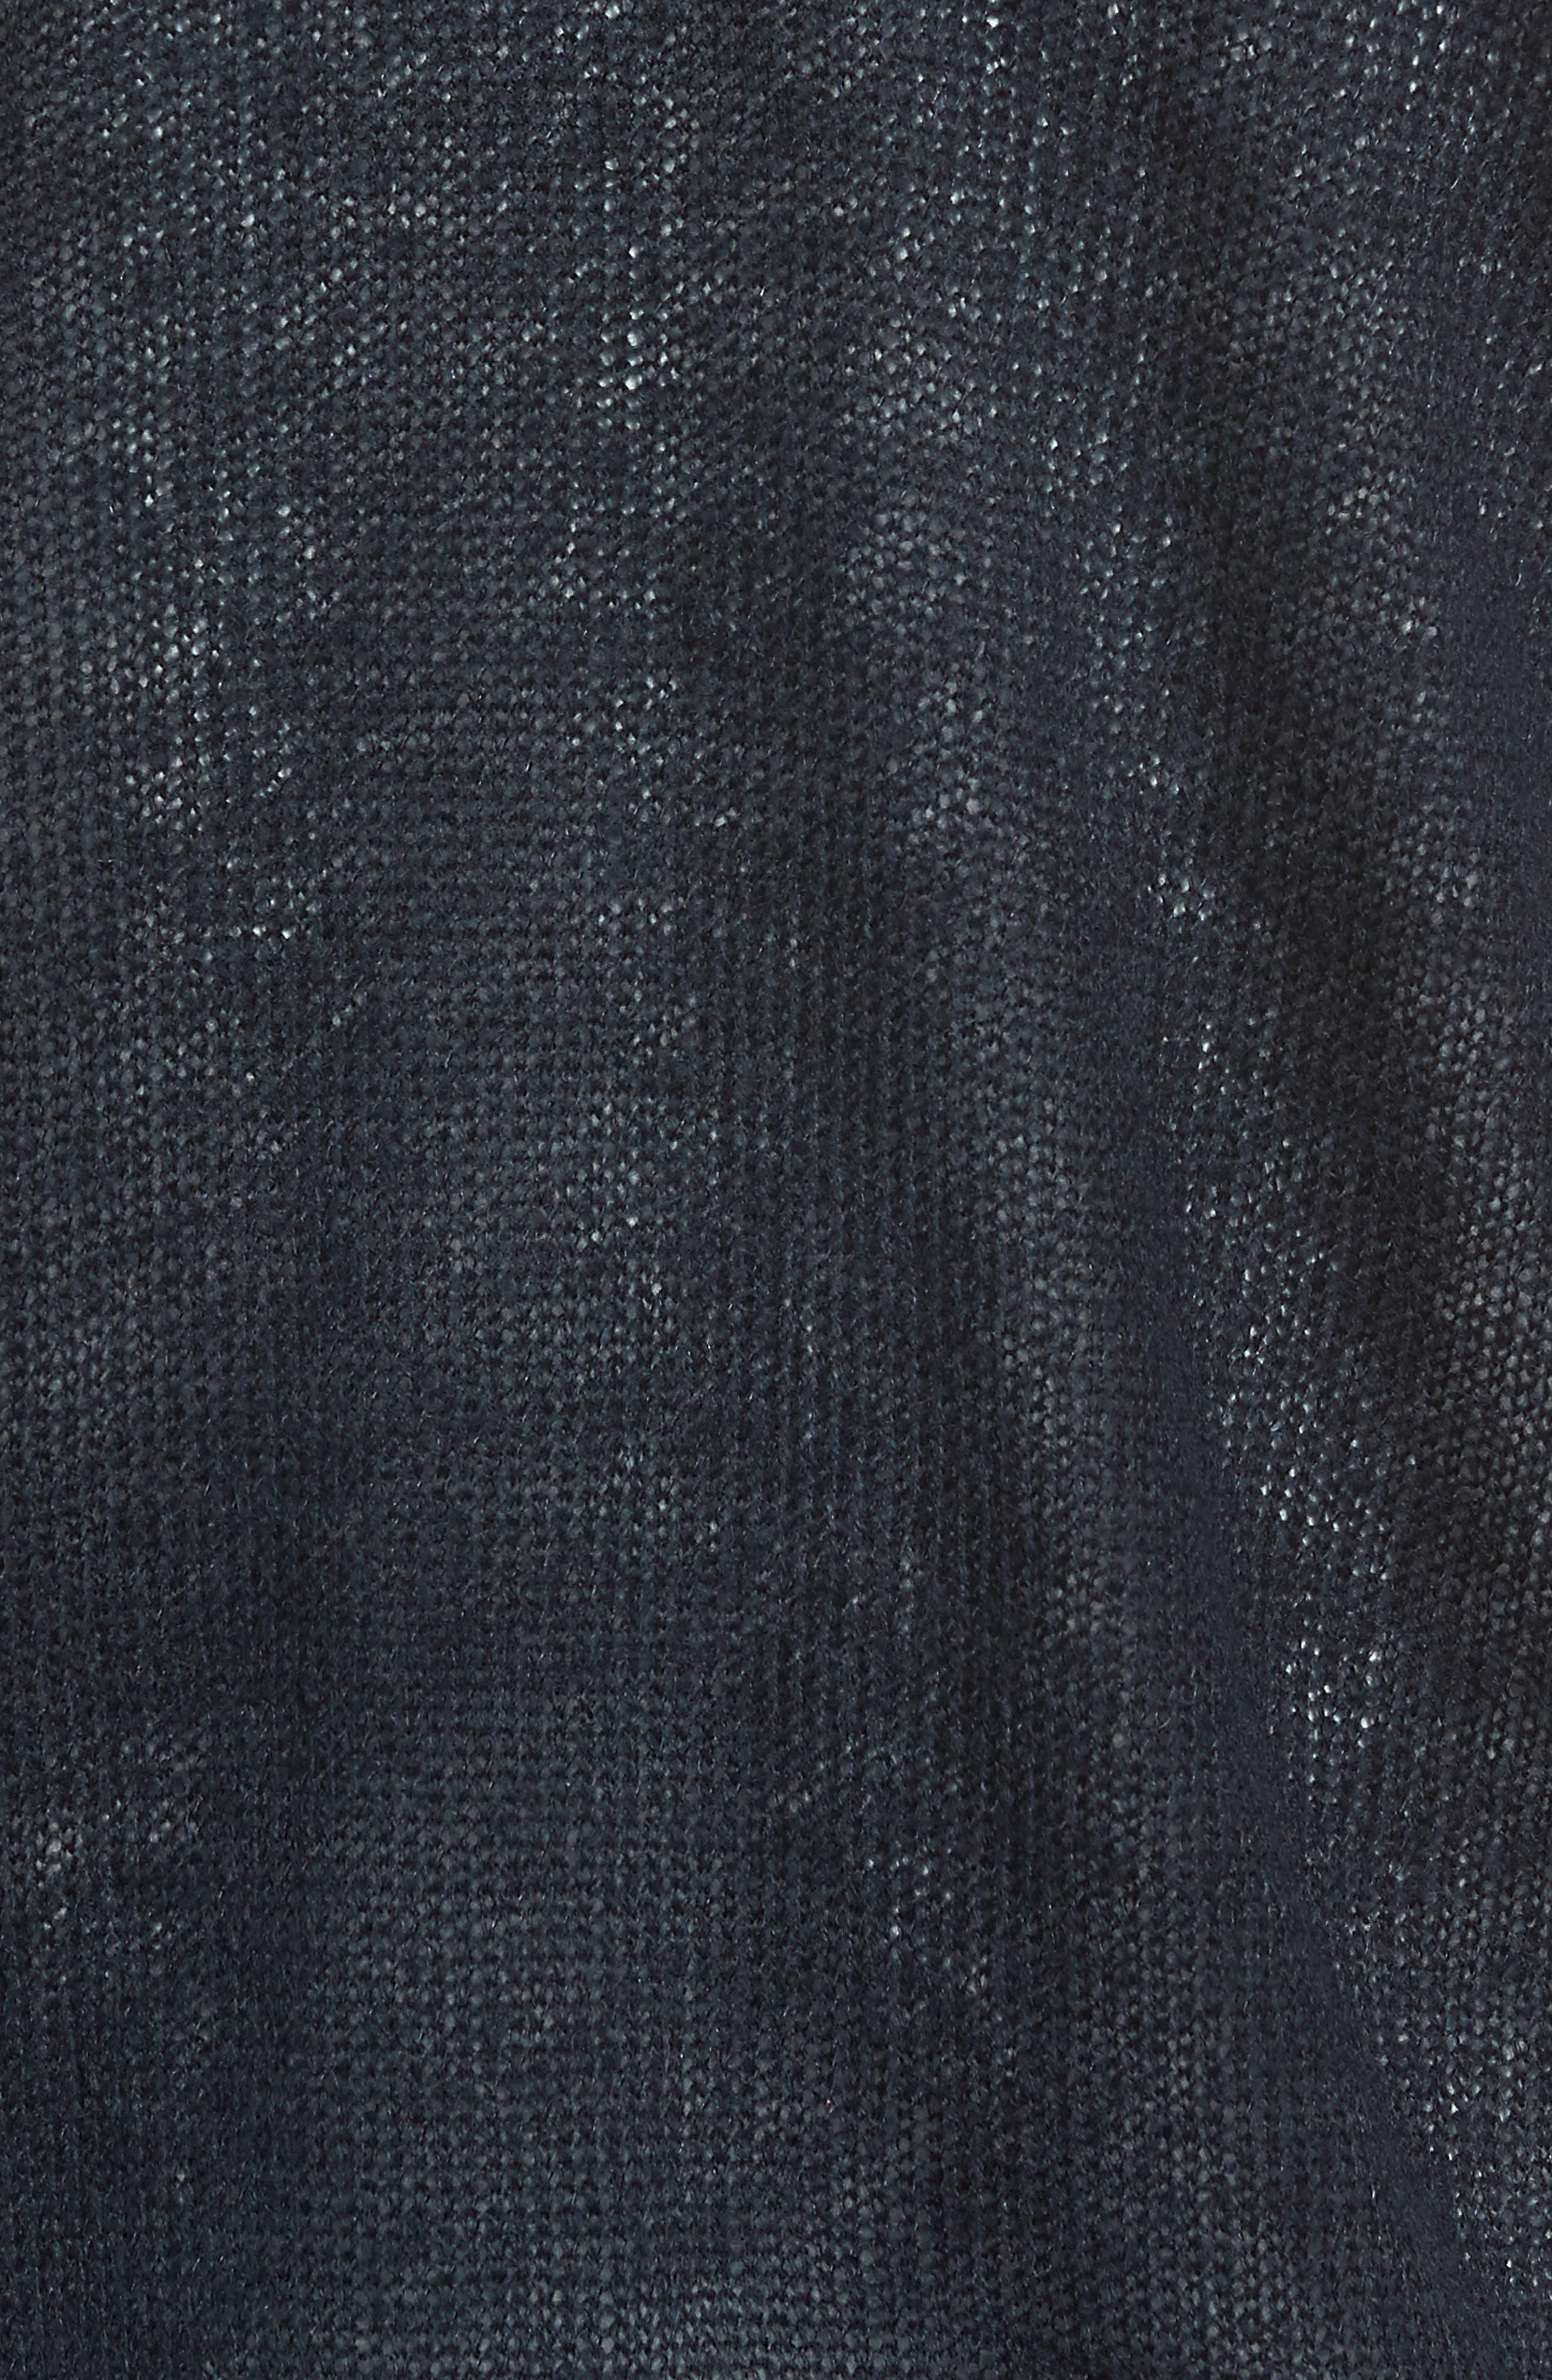 V-Neck Wrap Sweater,                             Alternate thumbnail 5, color,                             Deepest Navy